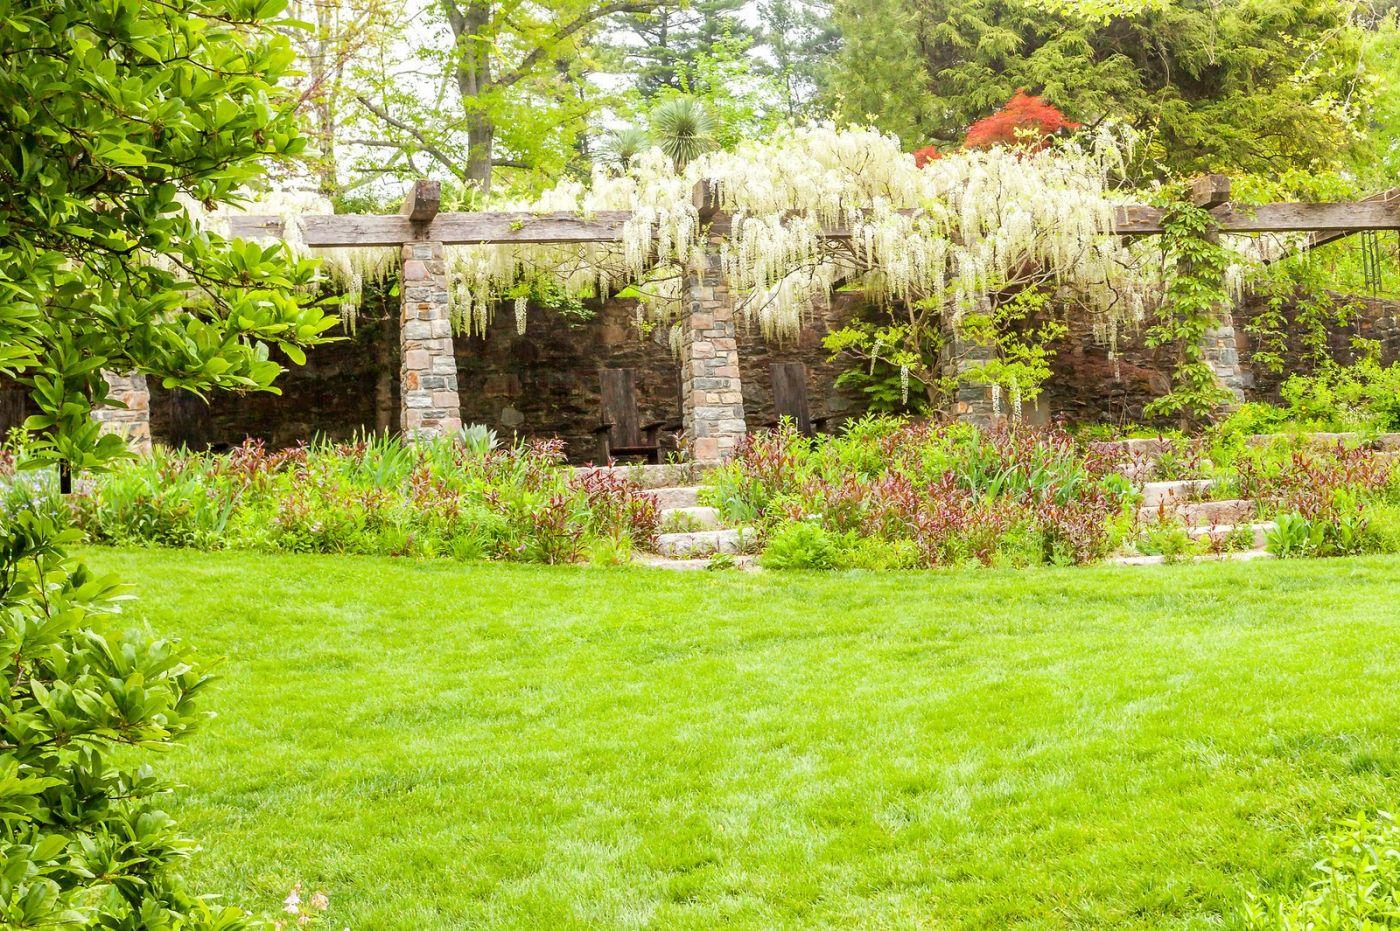 Chanticleer花园,那年盛开的紫藤花_图1-35